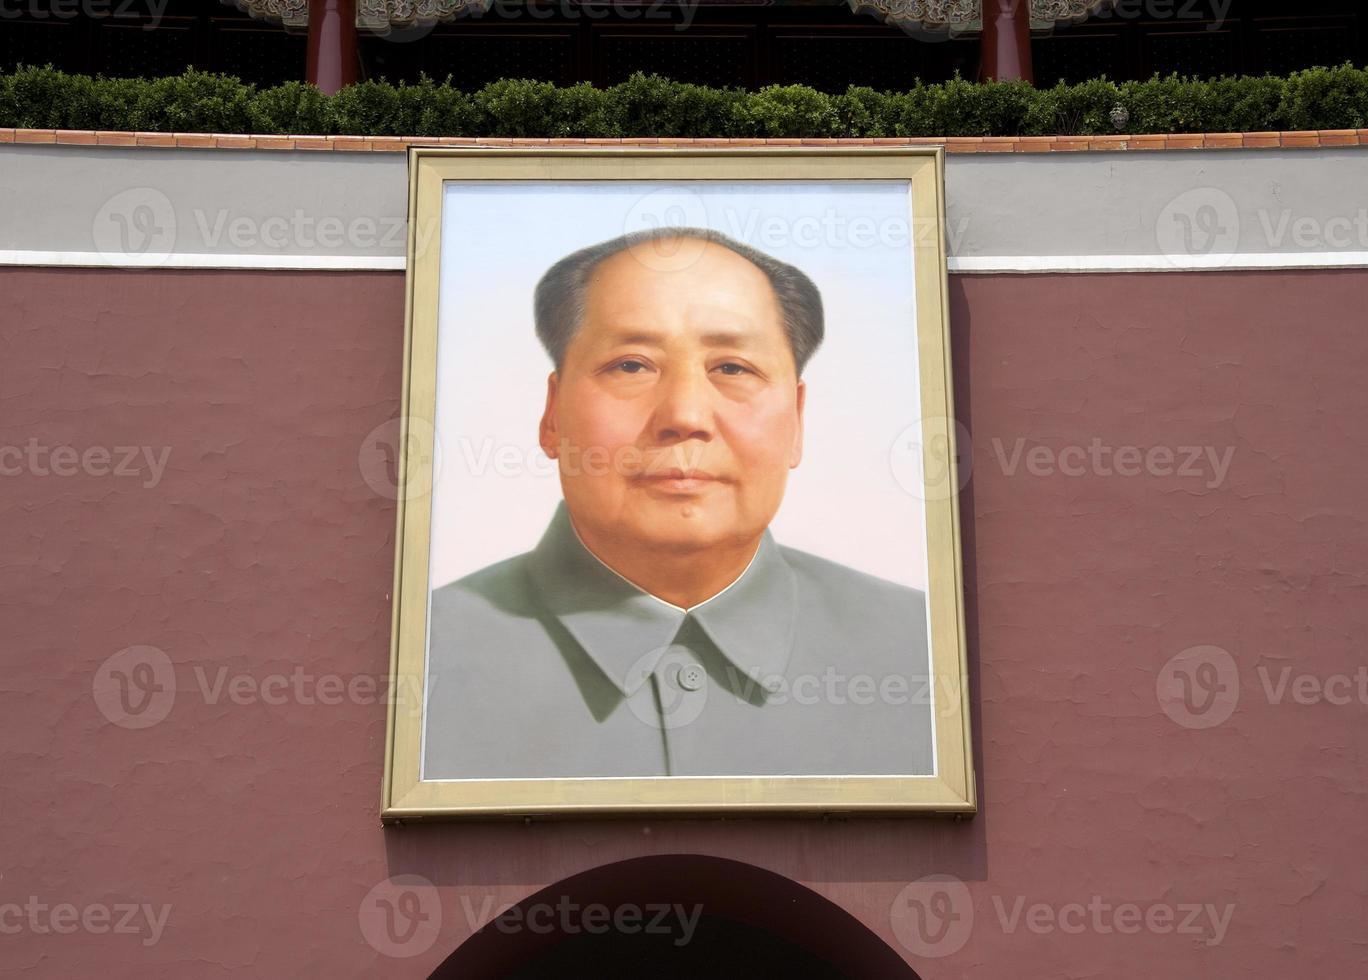 Mao's portrait photo